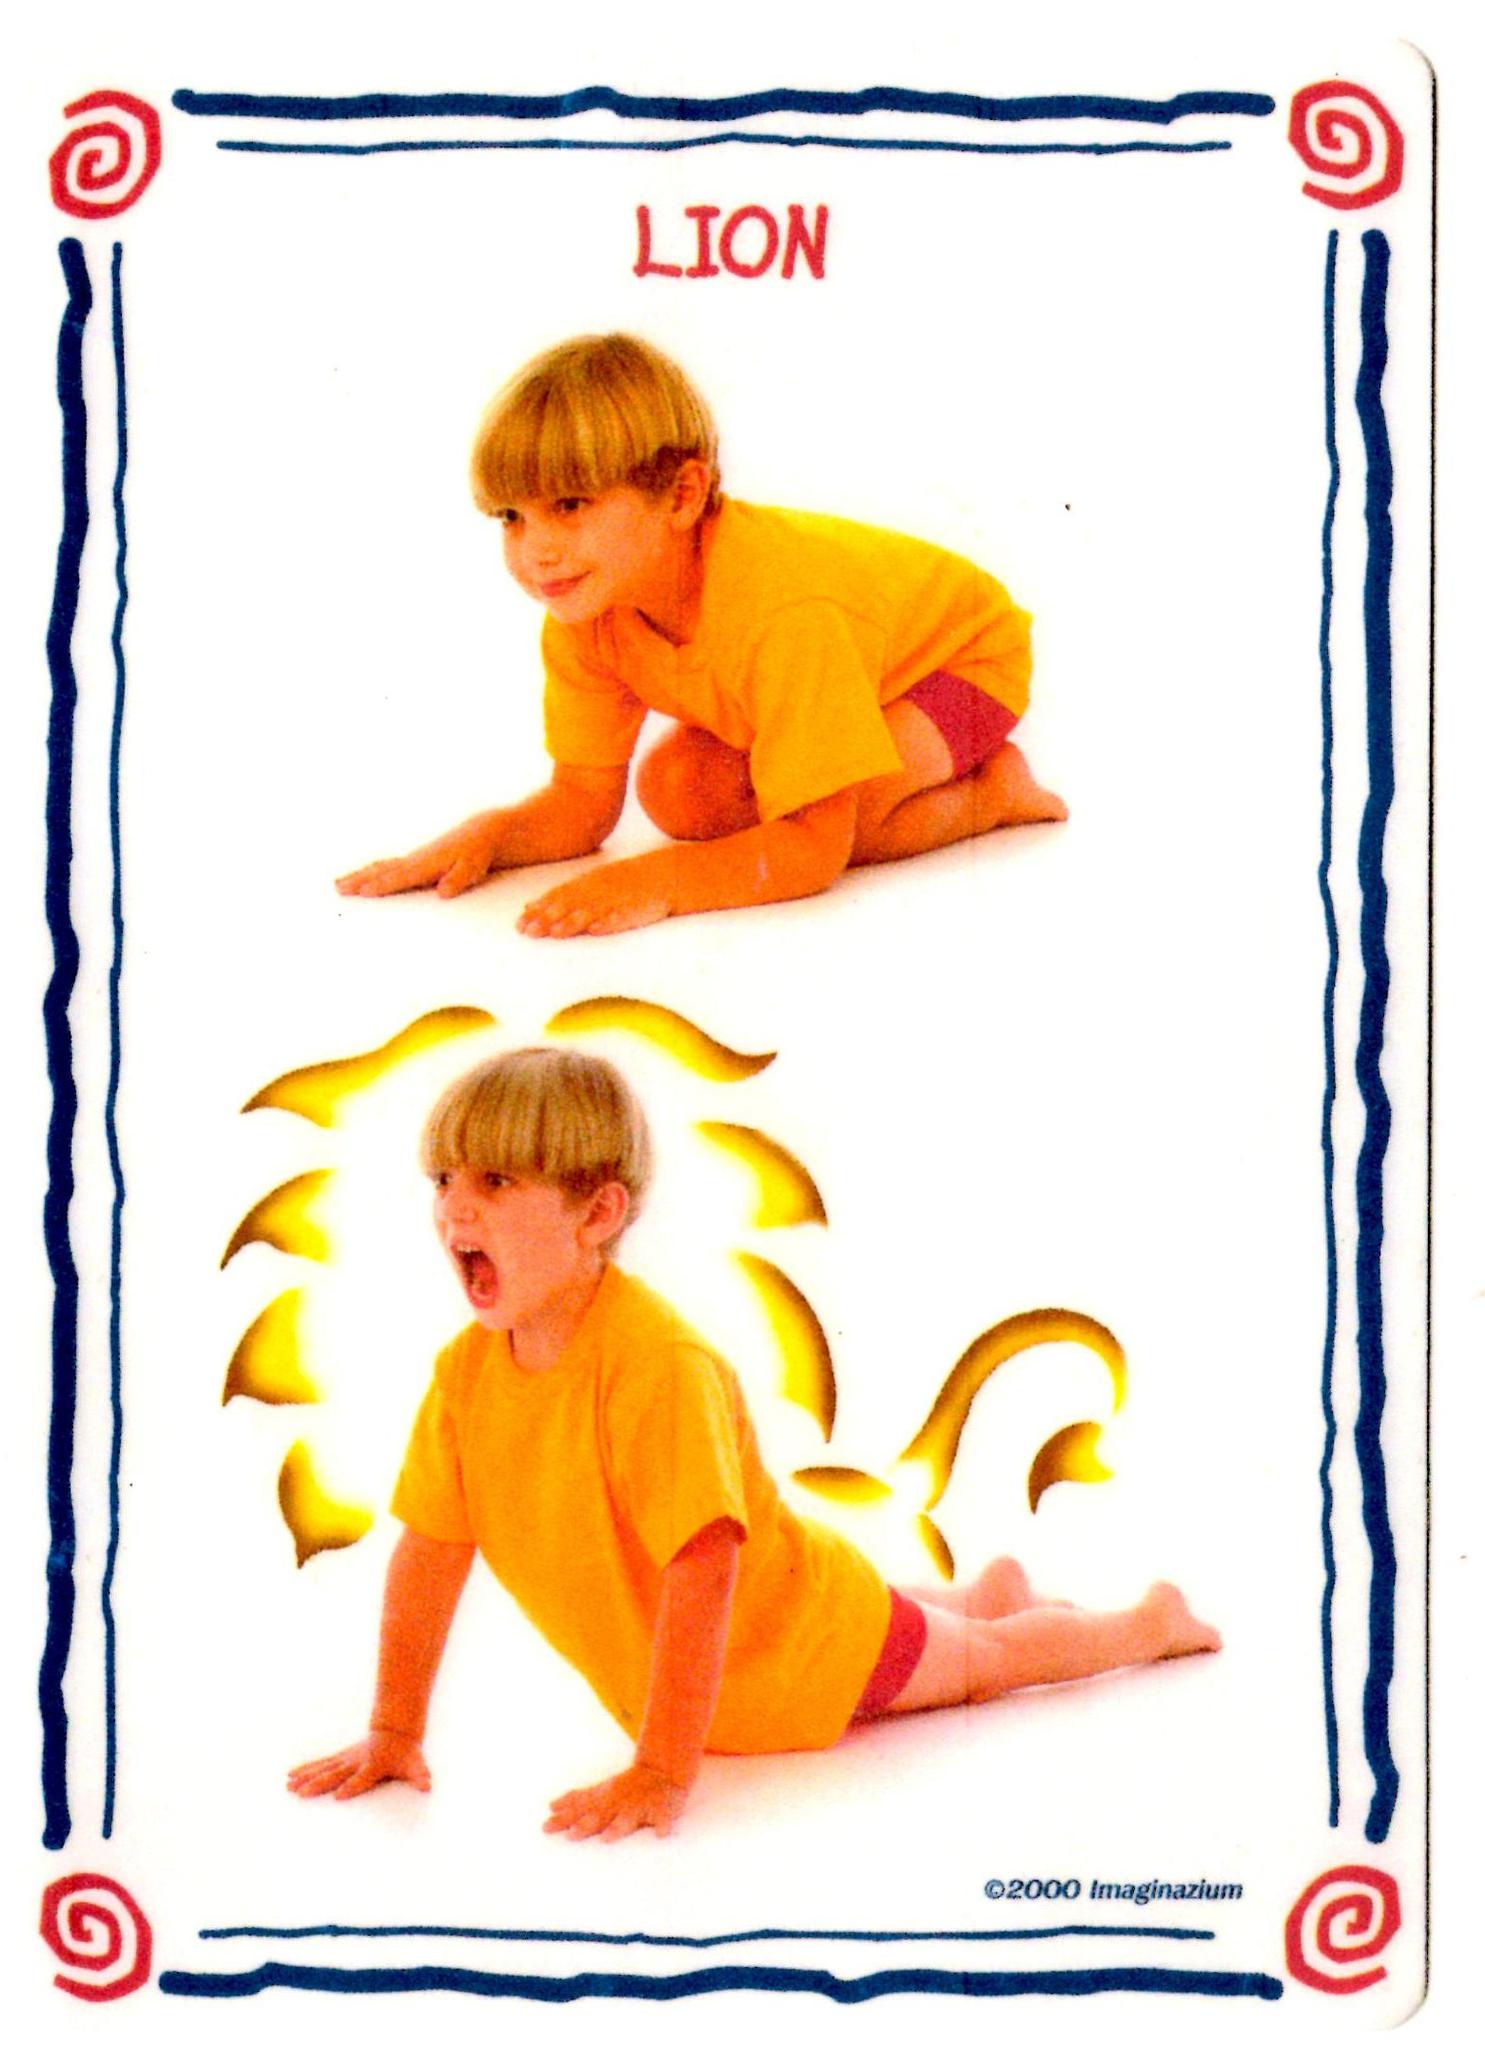 posture yoga lion